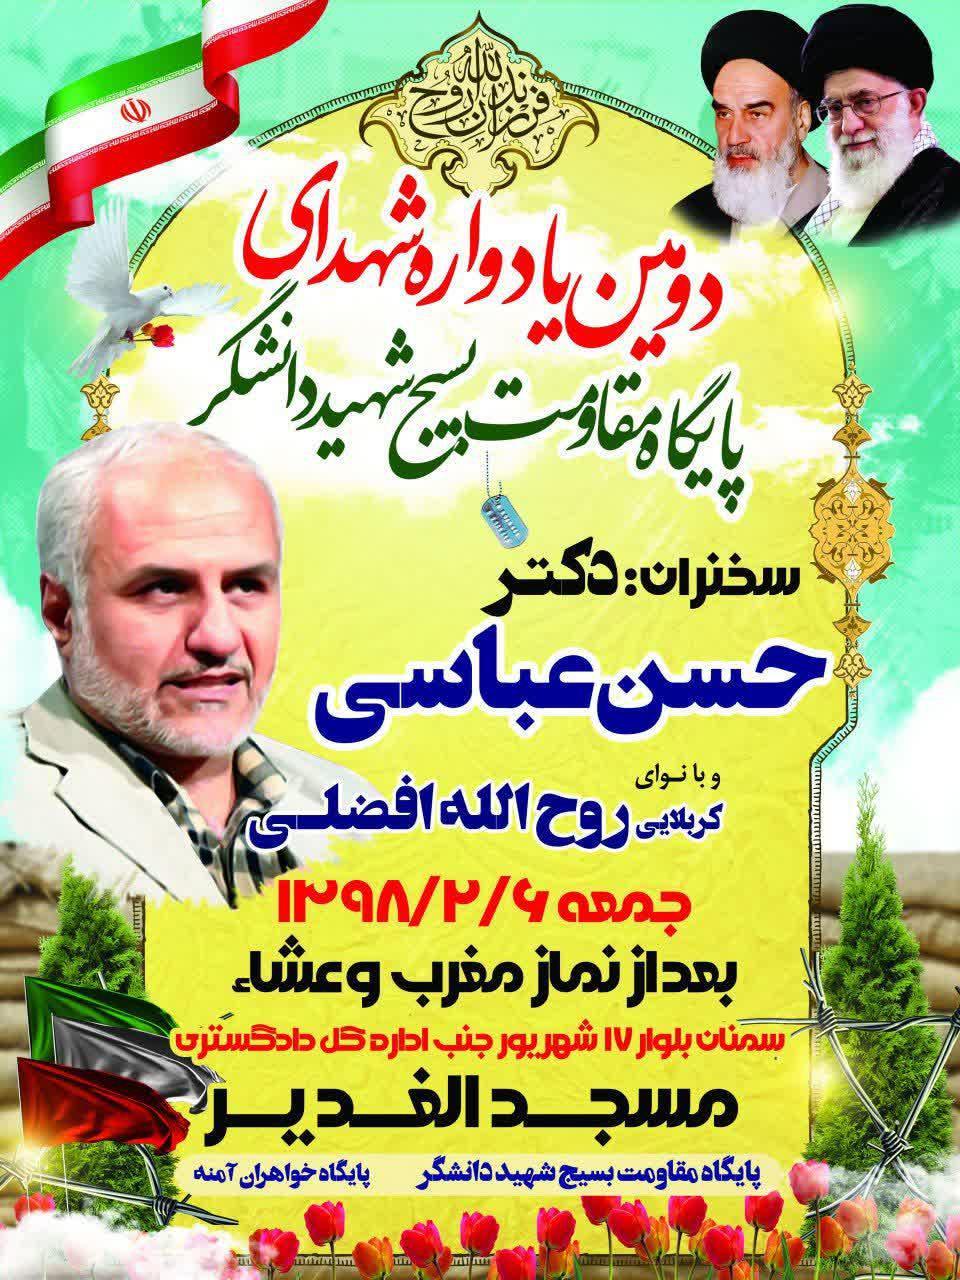 photo 2019 04 25 12 57 06 ۶ اردیبهشت ۹۸؛ سخنرانی استاد حسن عباسی در سمنان